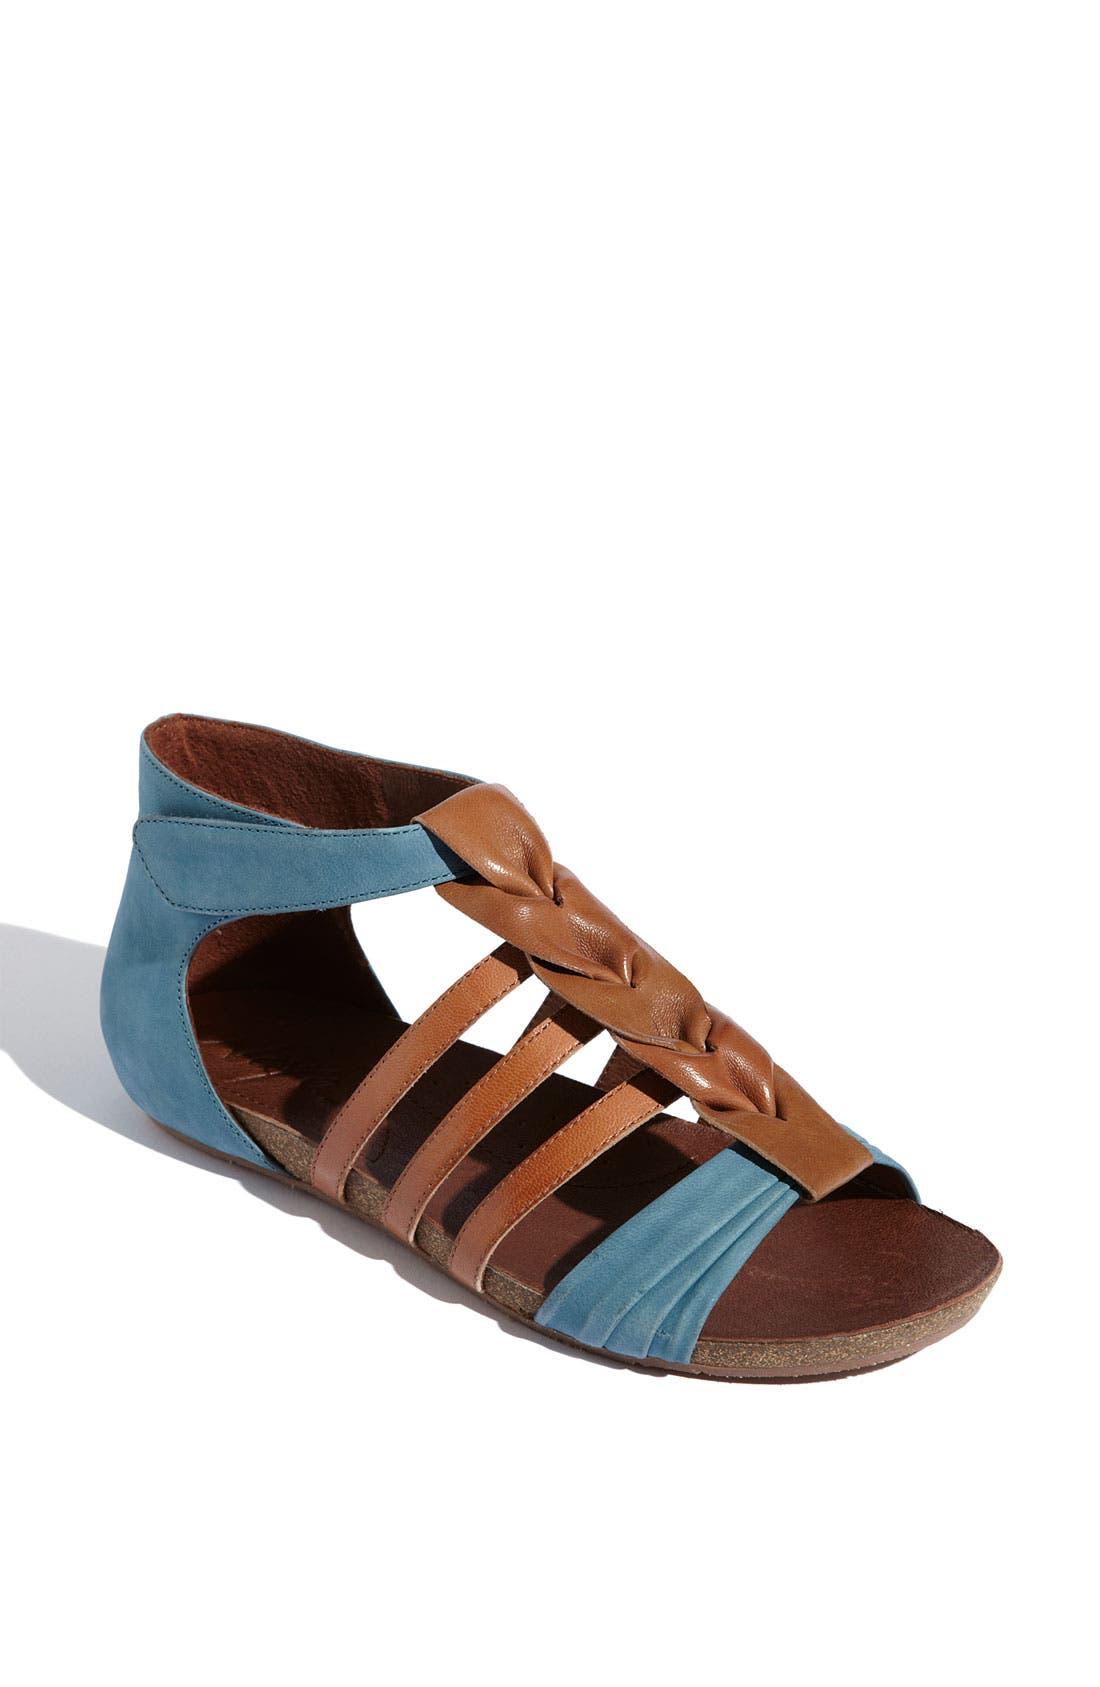 Main Image - Naya 'Palomi' Sandal